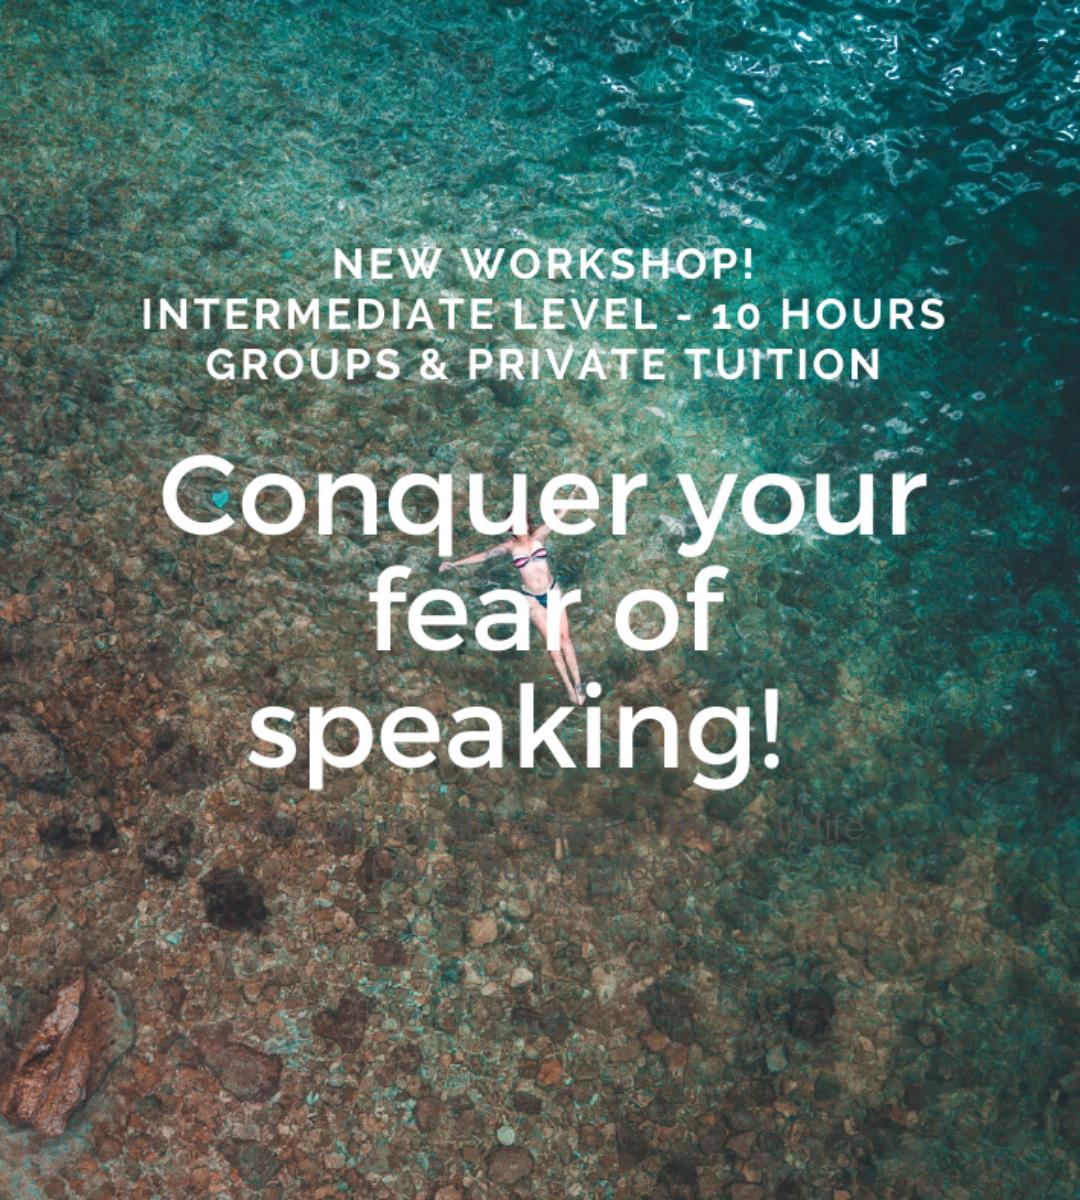 10hs workshop inter